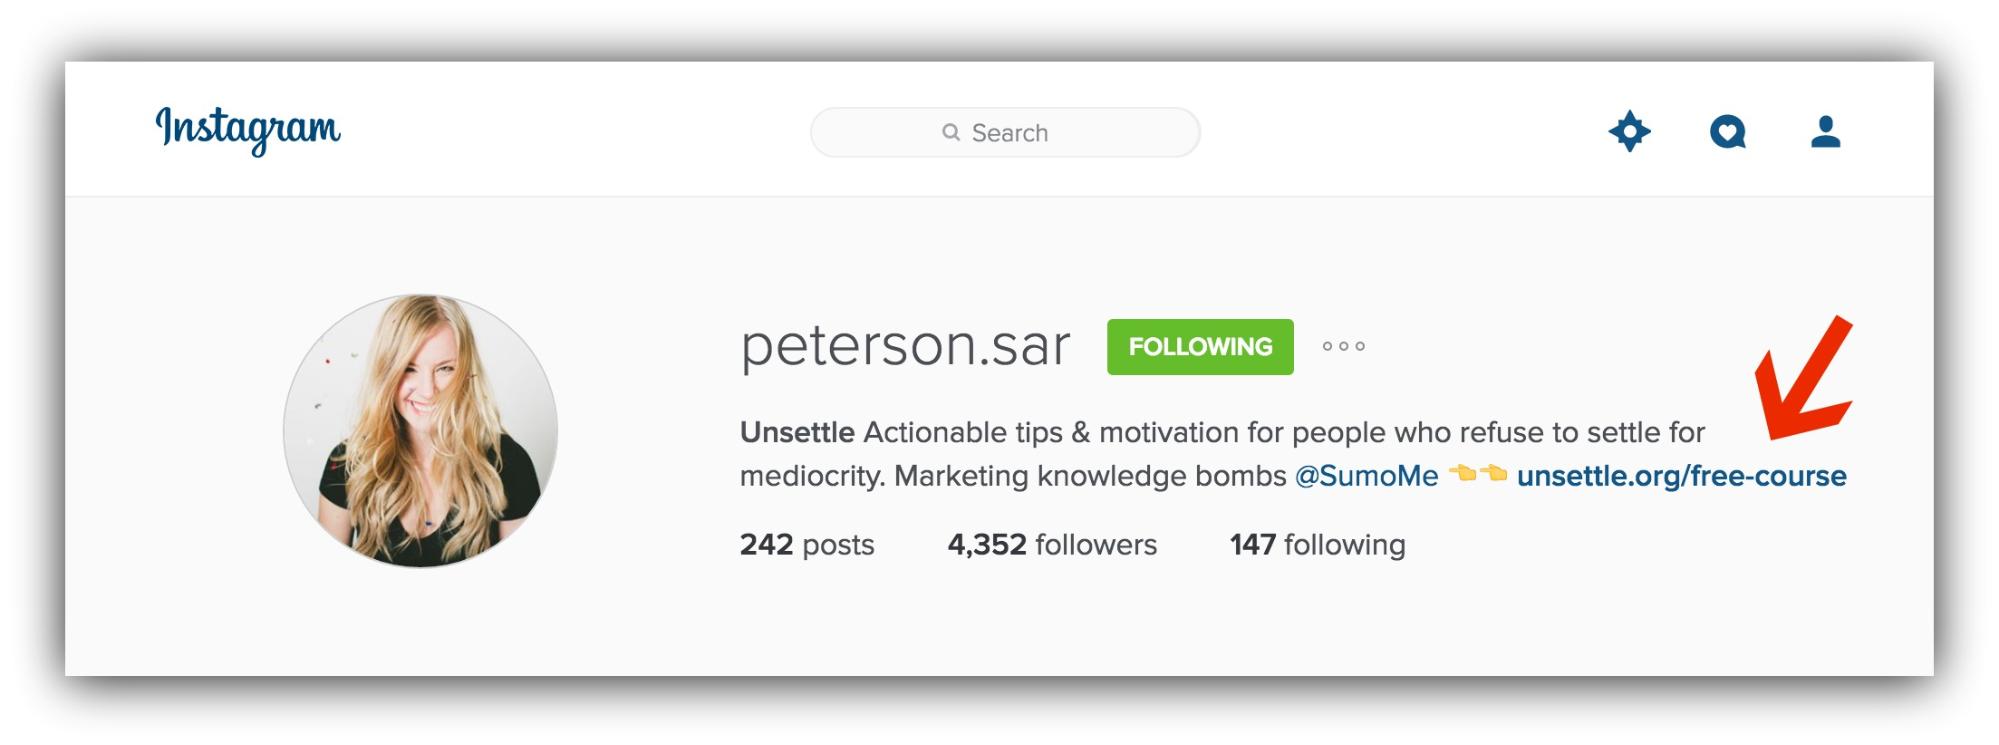 Screenshot showing sarah peterson